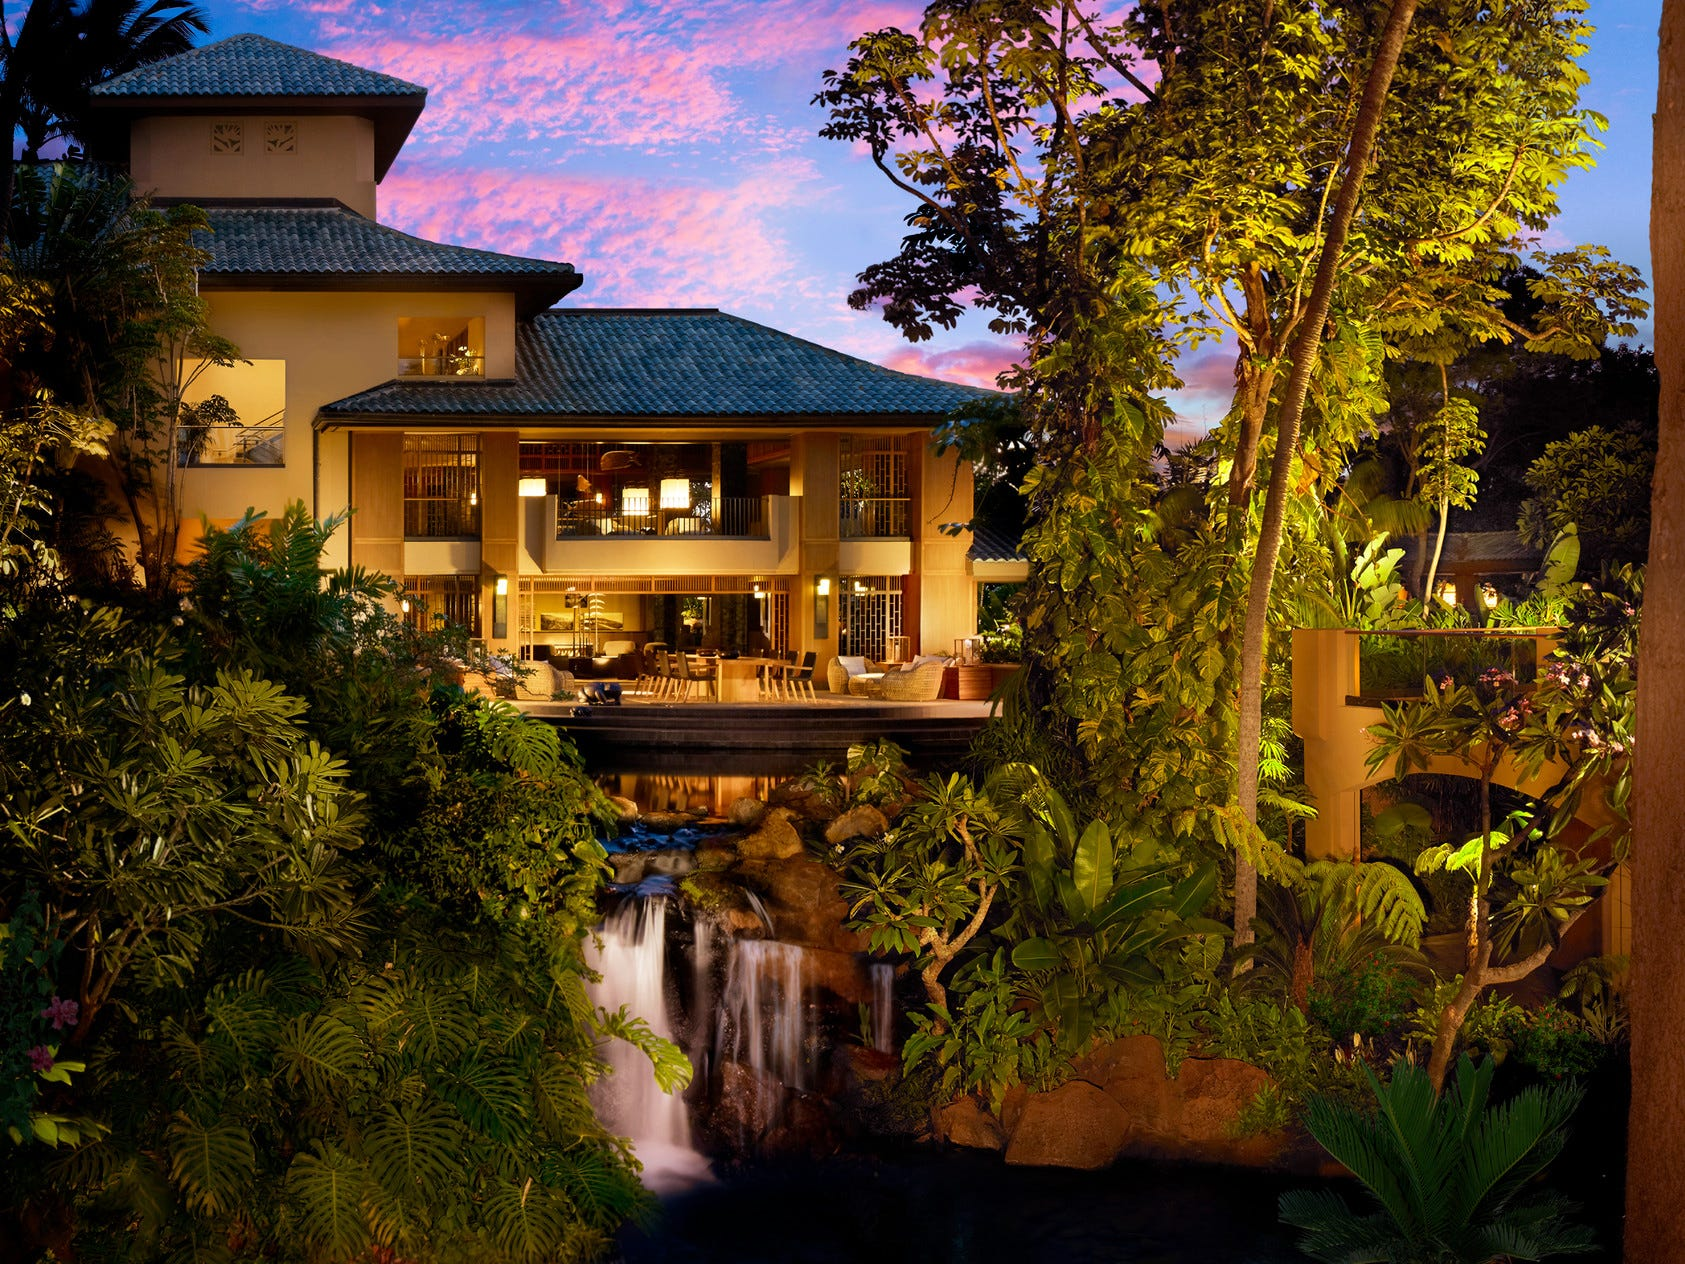 The Four Seasons Resort Lanai in Hawaii.